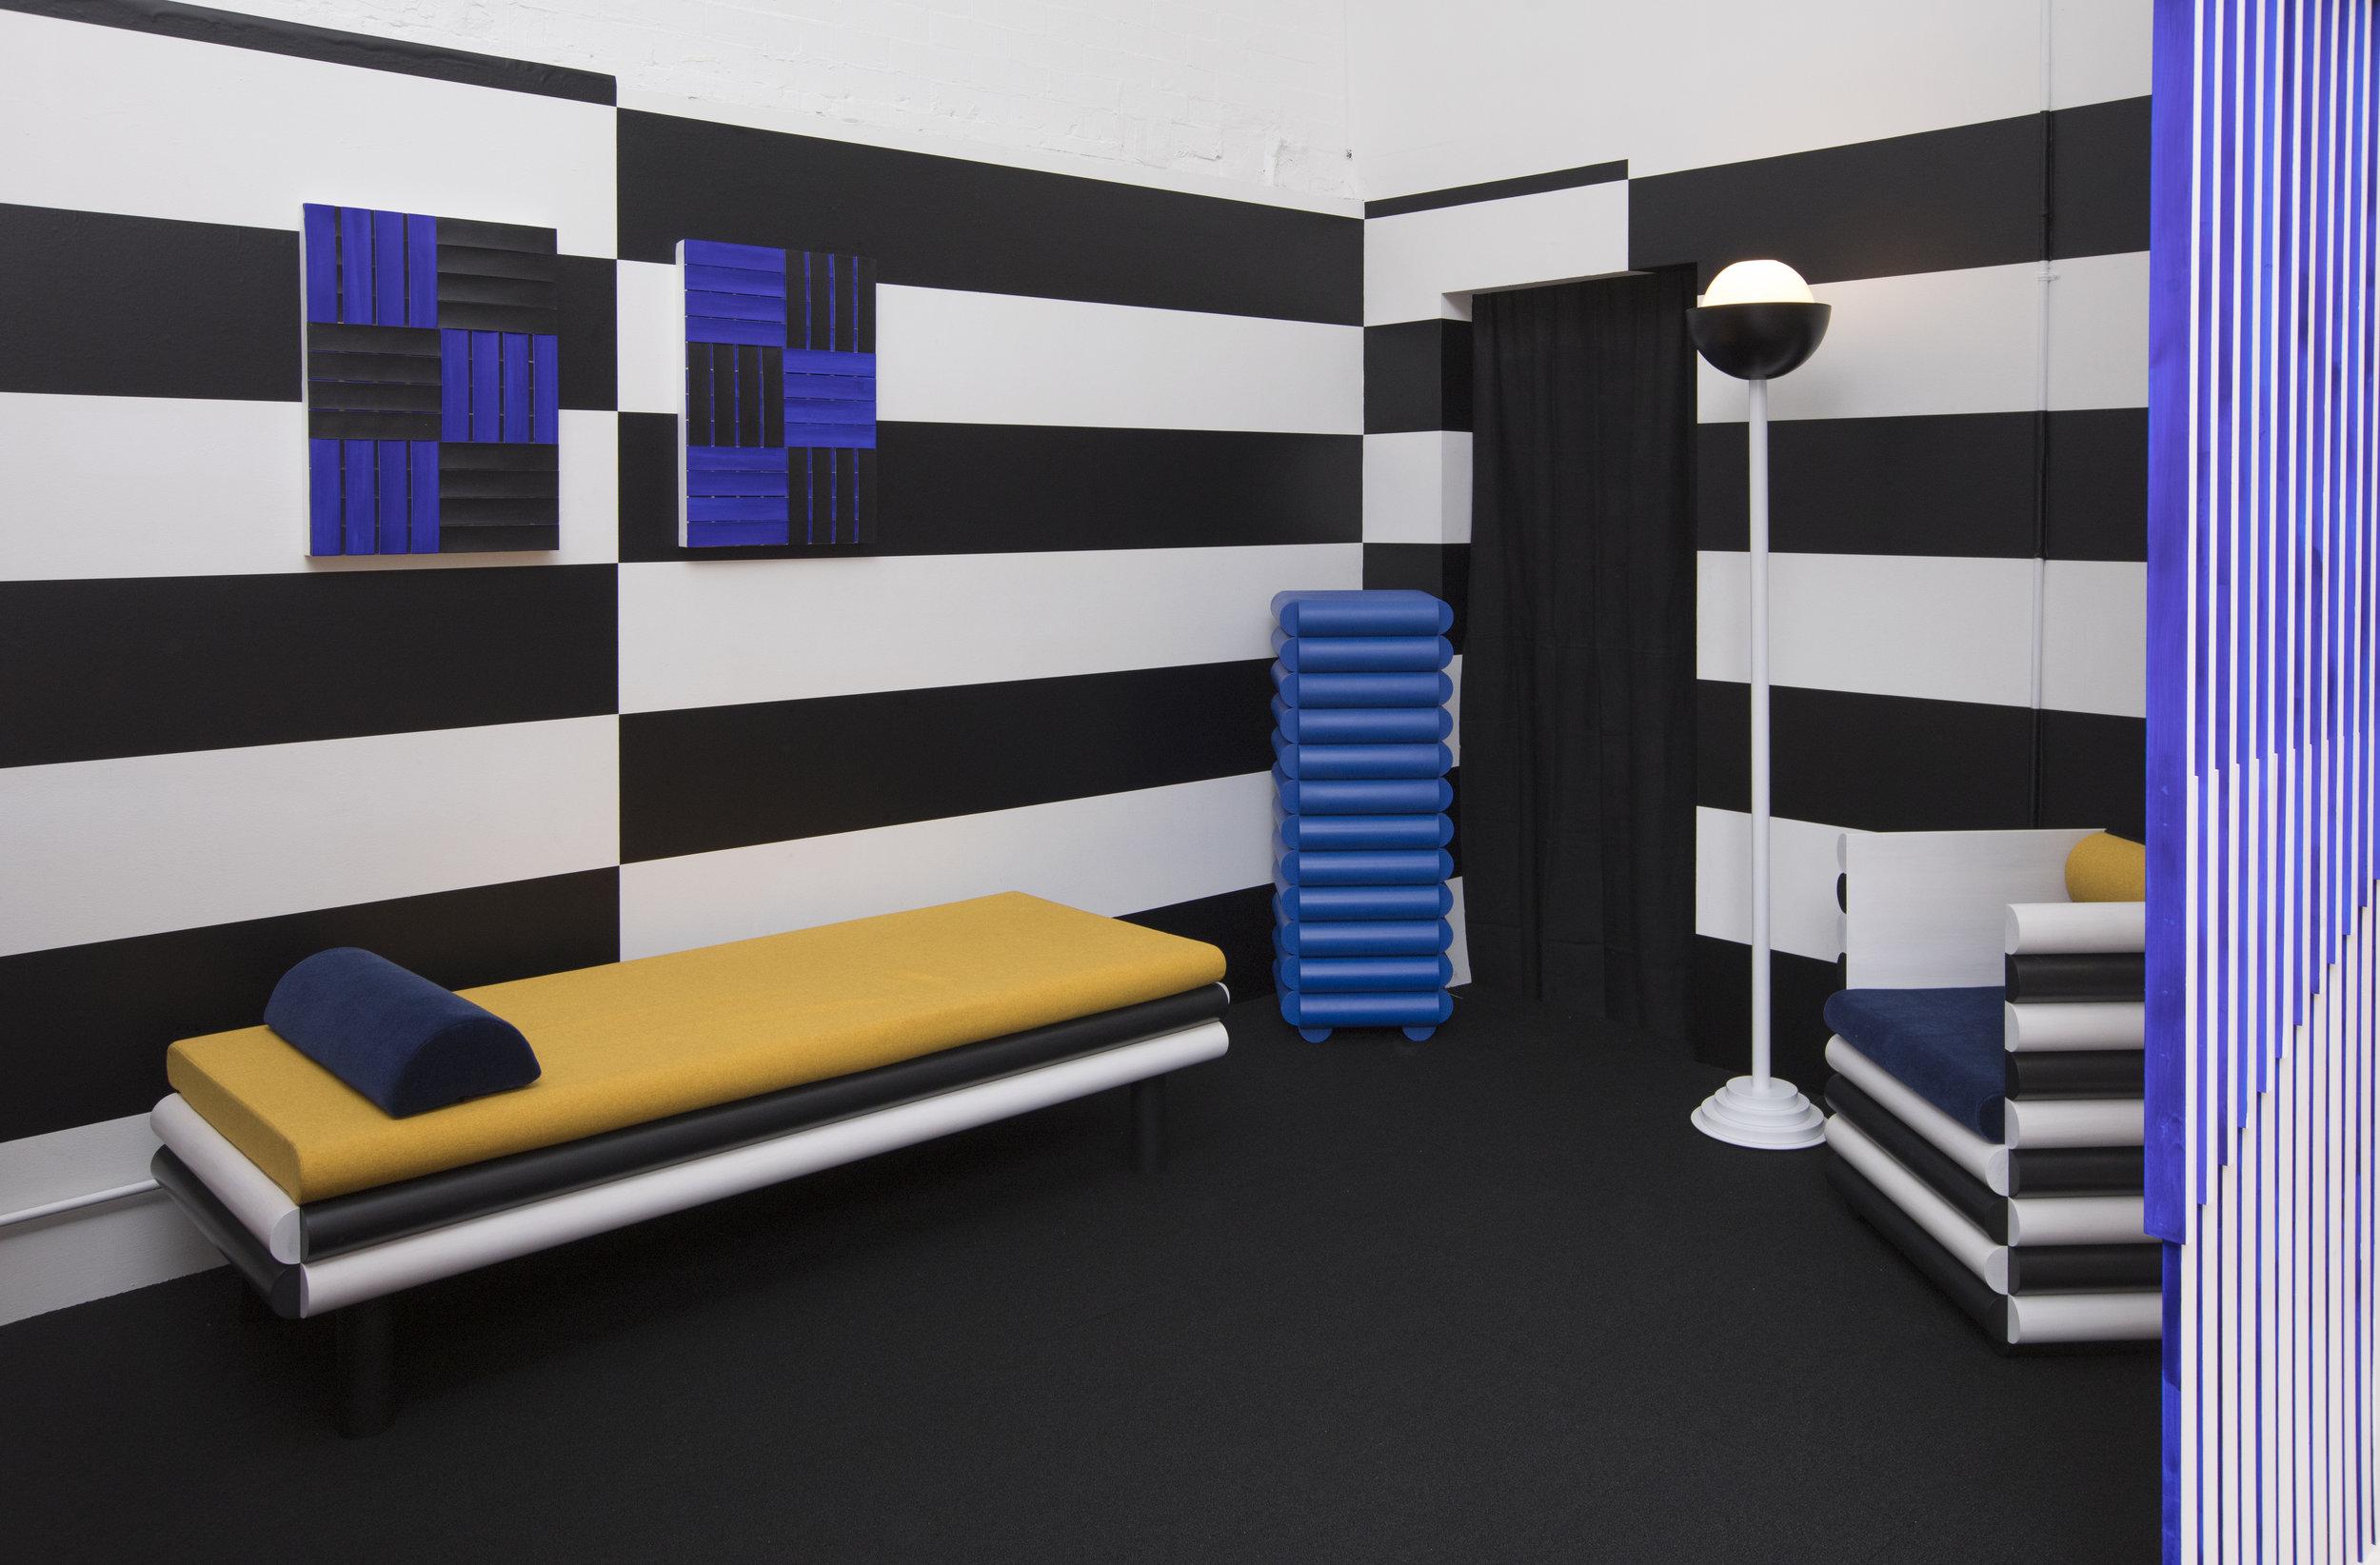 Hotel Tonight_Steven Bukowski x Hannah Bigeleisen1.jpg